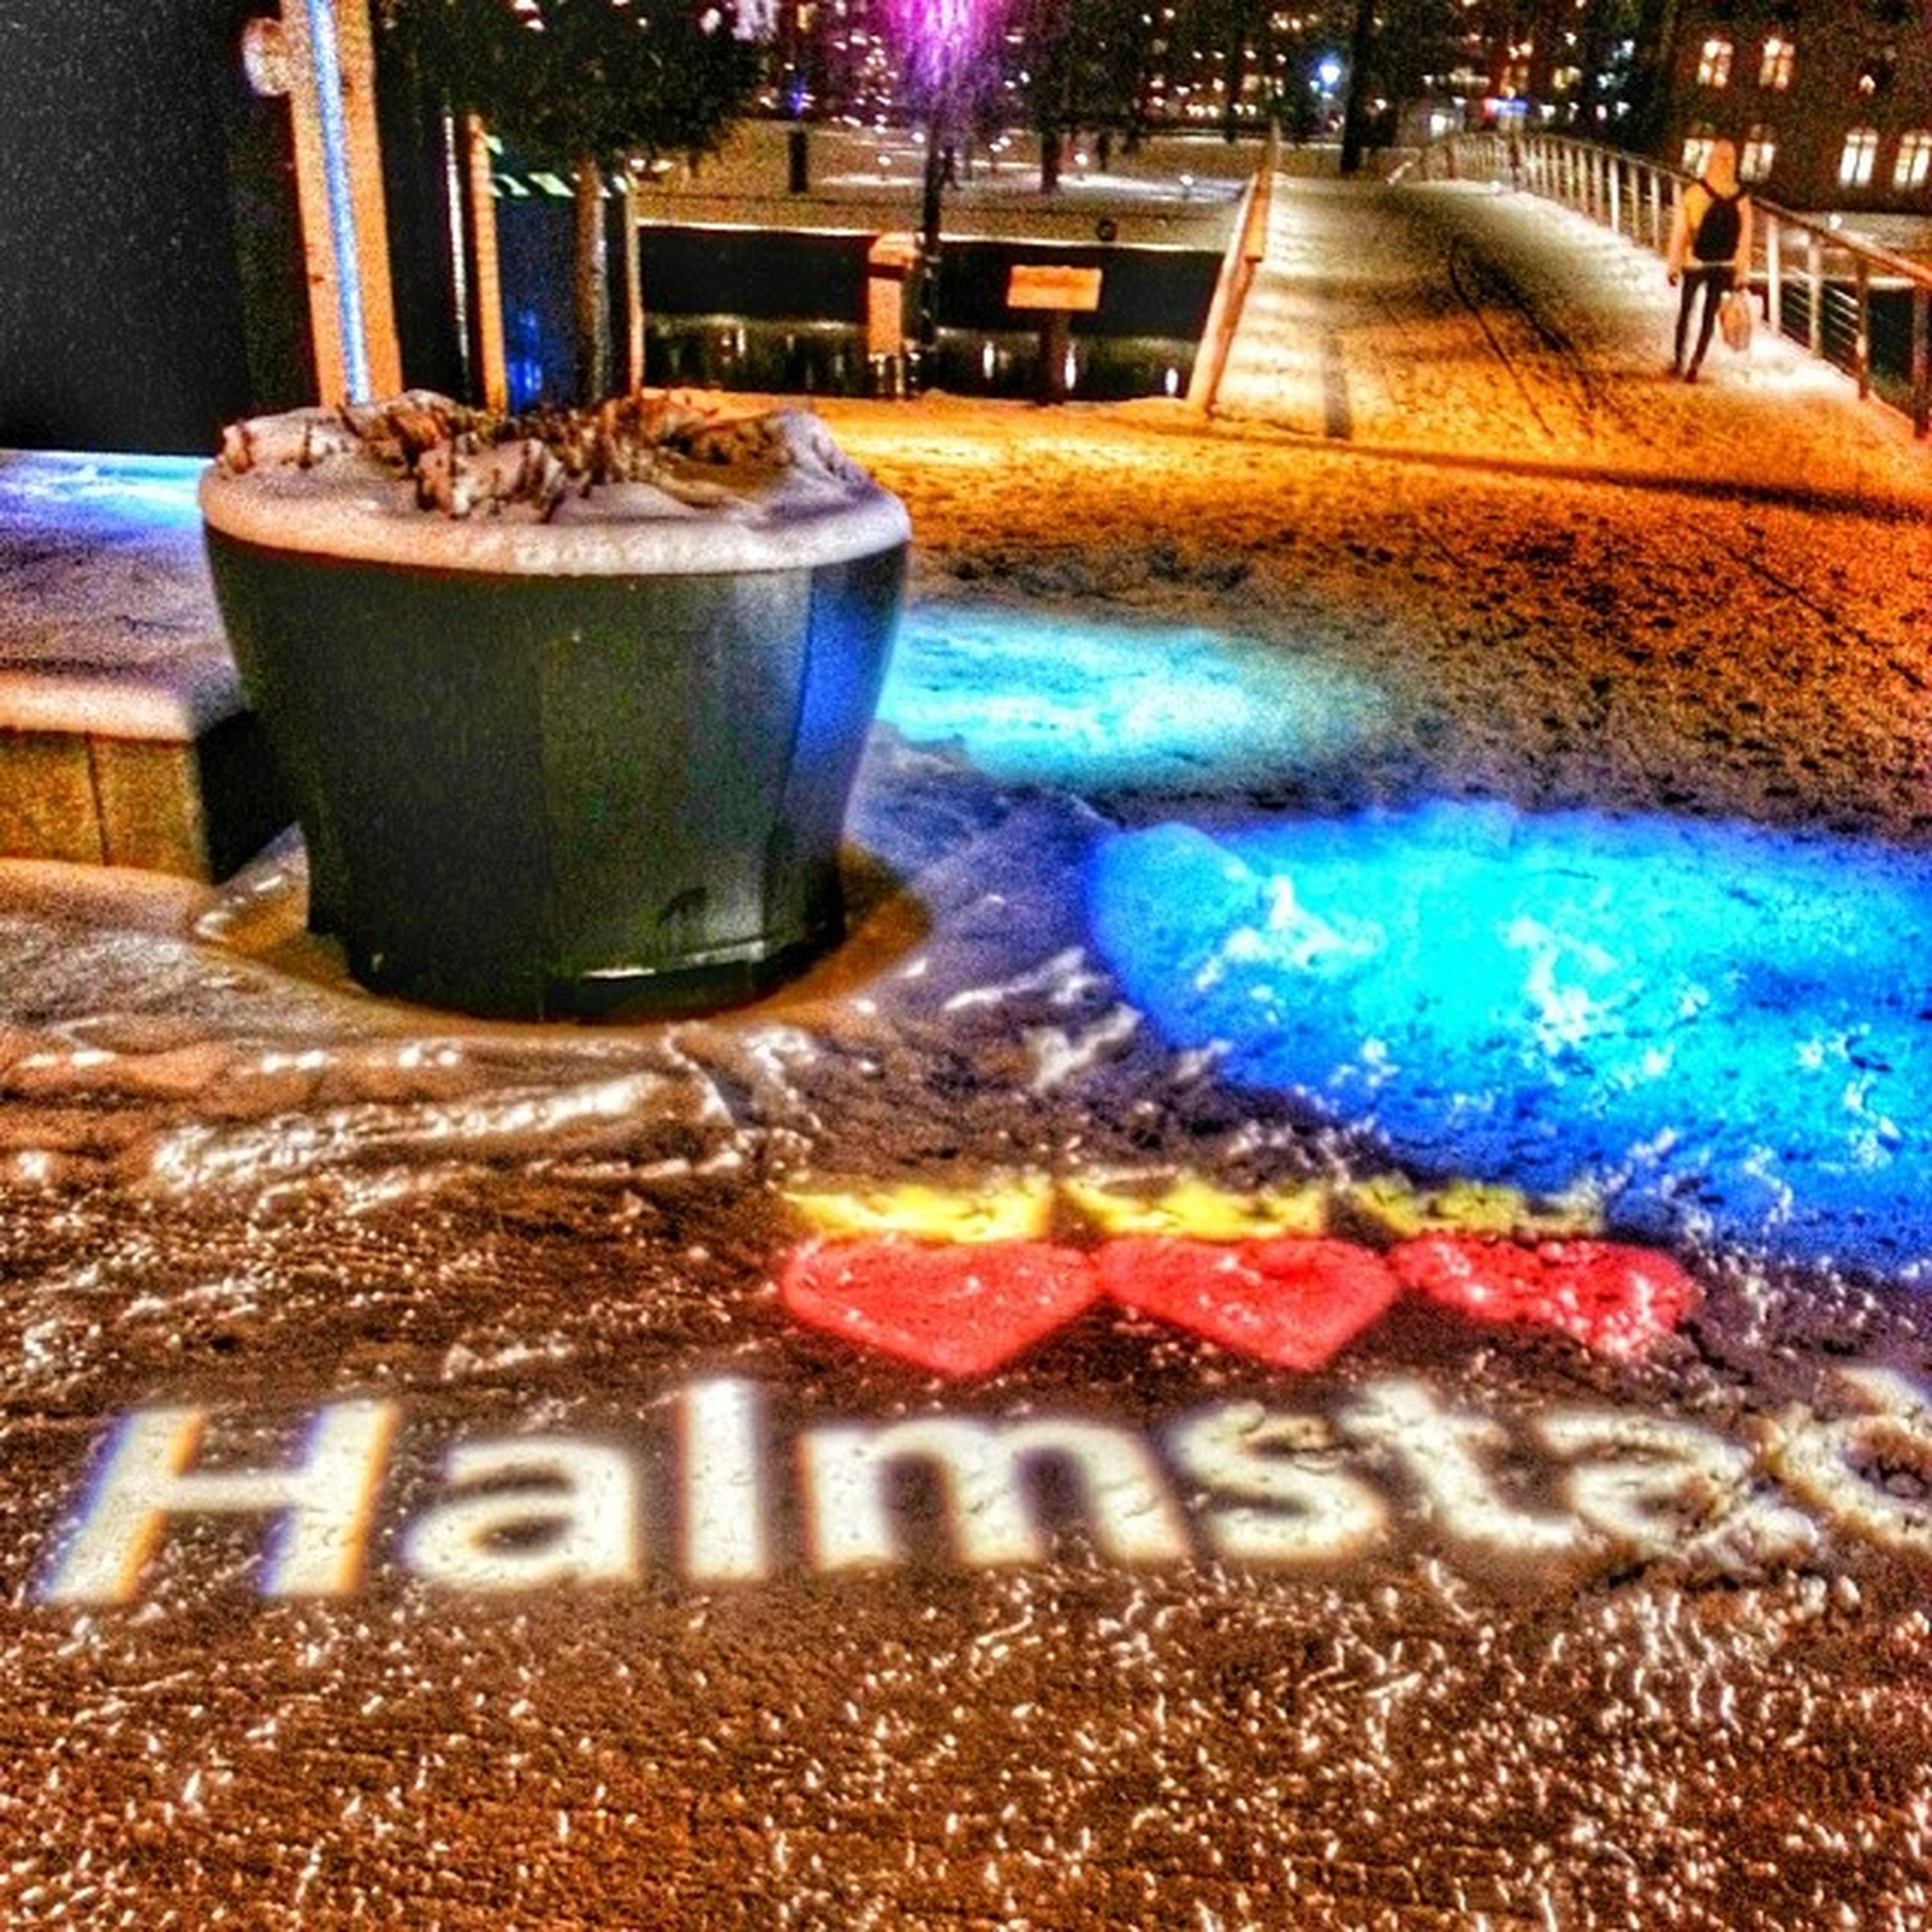 Godjul Trehj ärtan Hejhalmstad 7dagarbilden internationalpictures halmstad vinter snö city snow winter